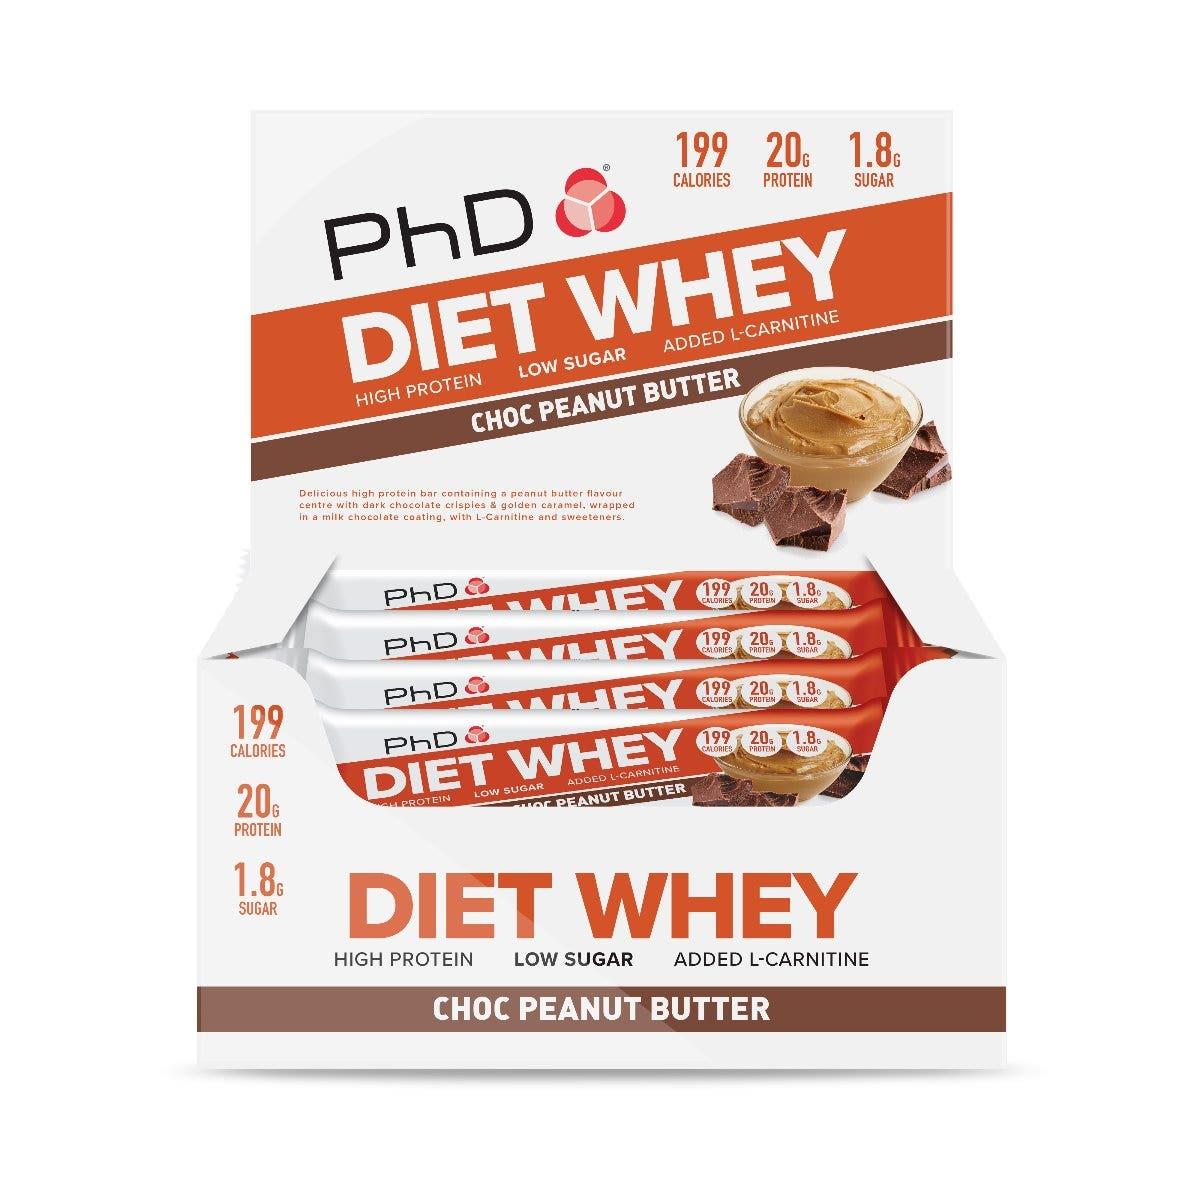 Diet Whey Bar - 12 pack